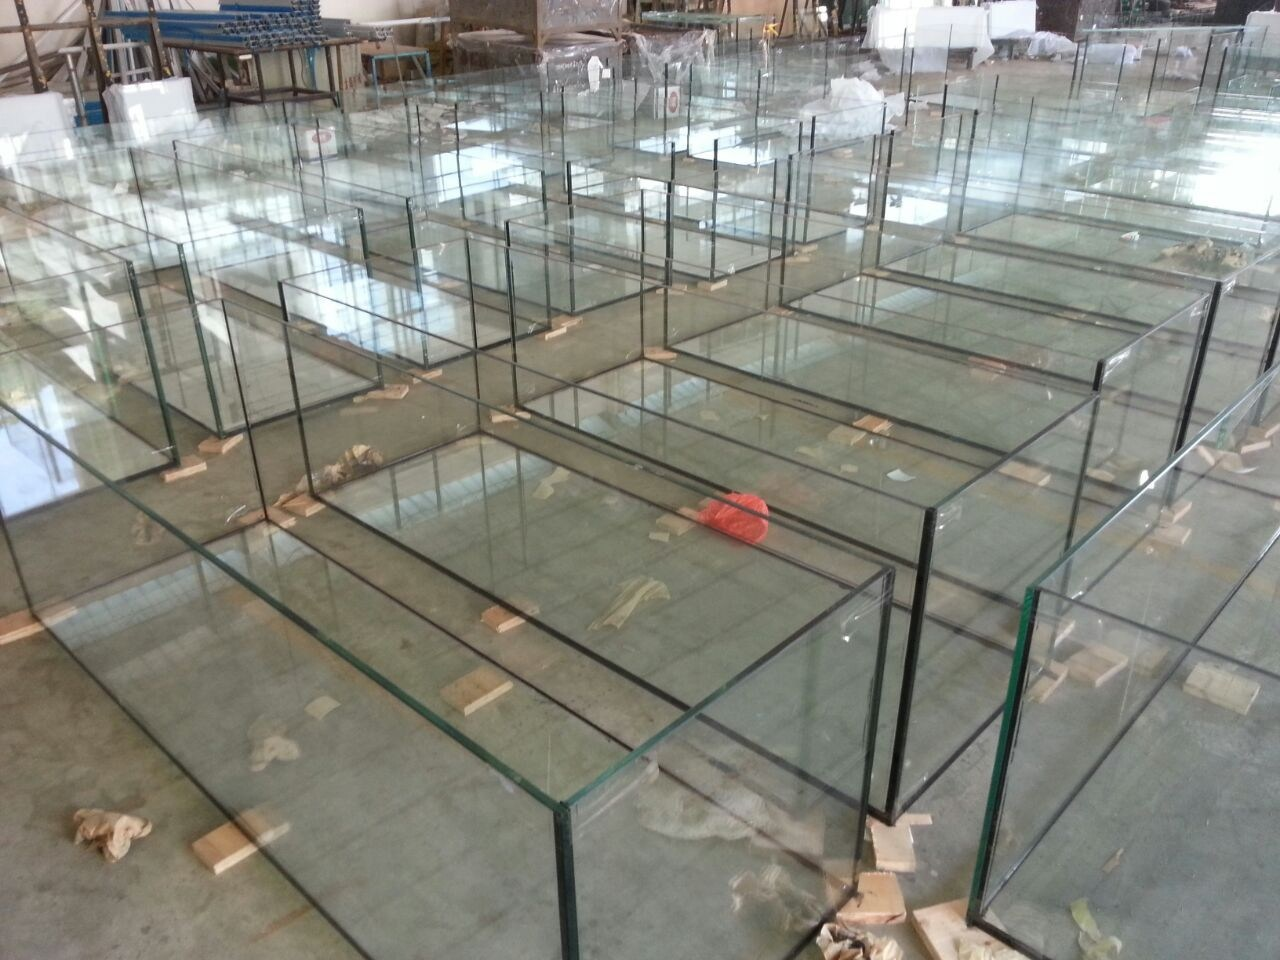 Fish aquarium manufacturers - High Quality Ultra Clear Glass Fish Tanks